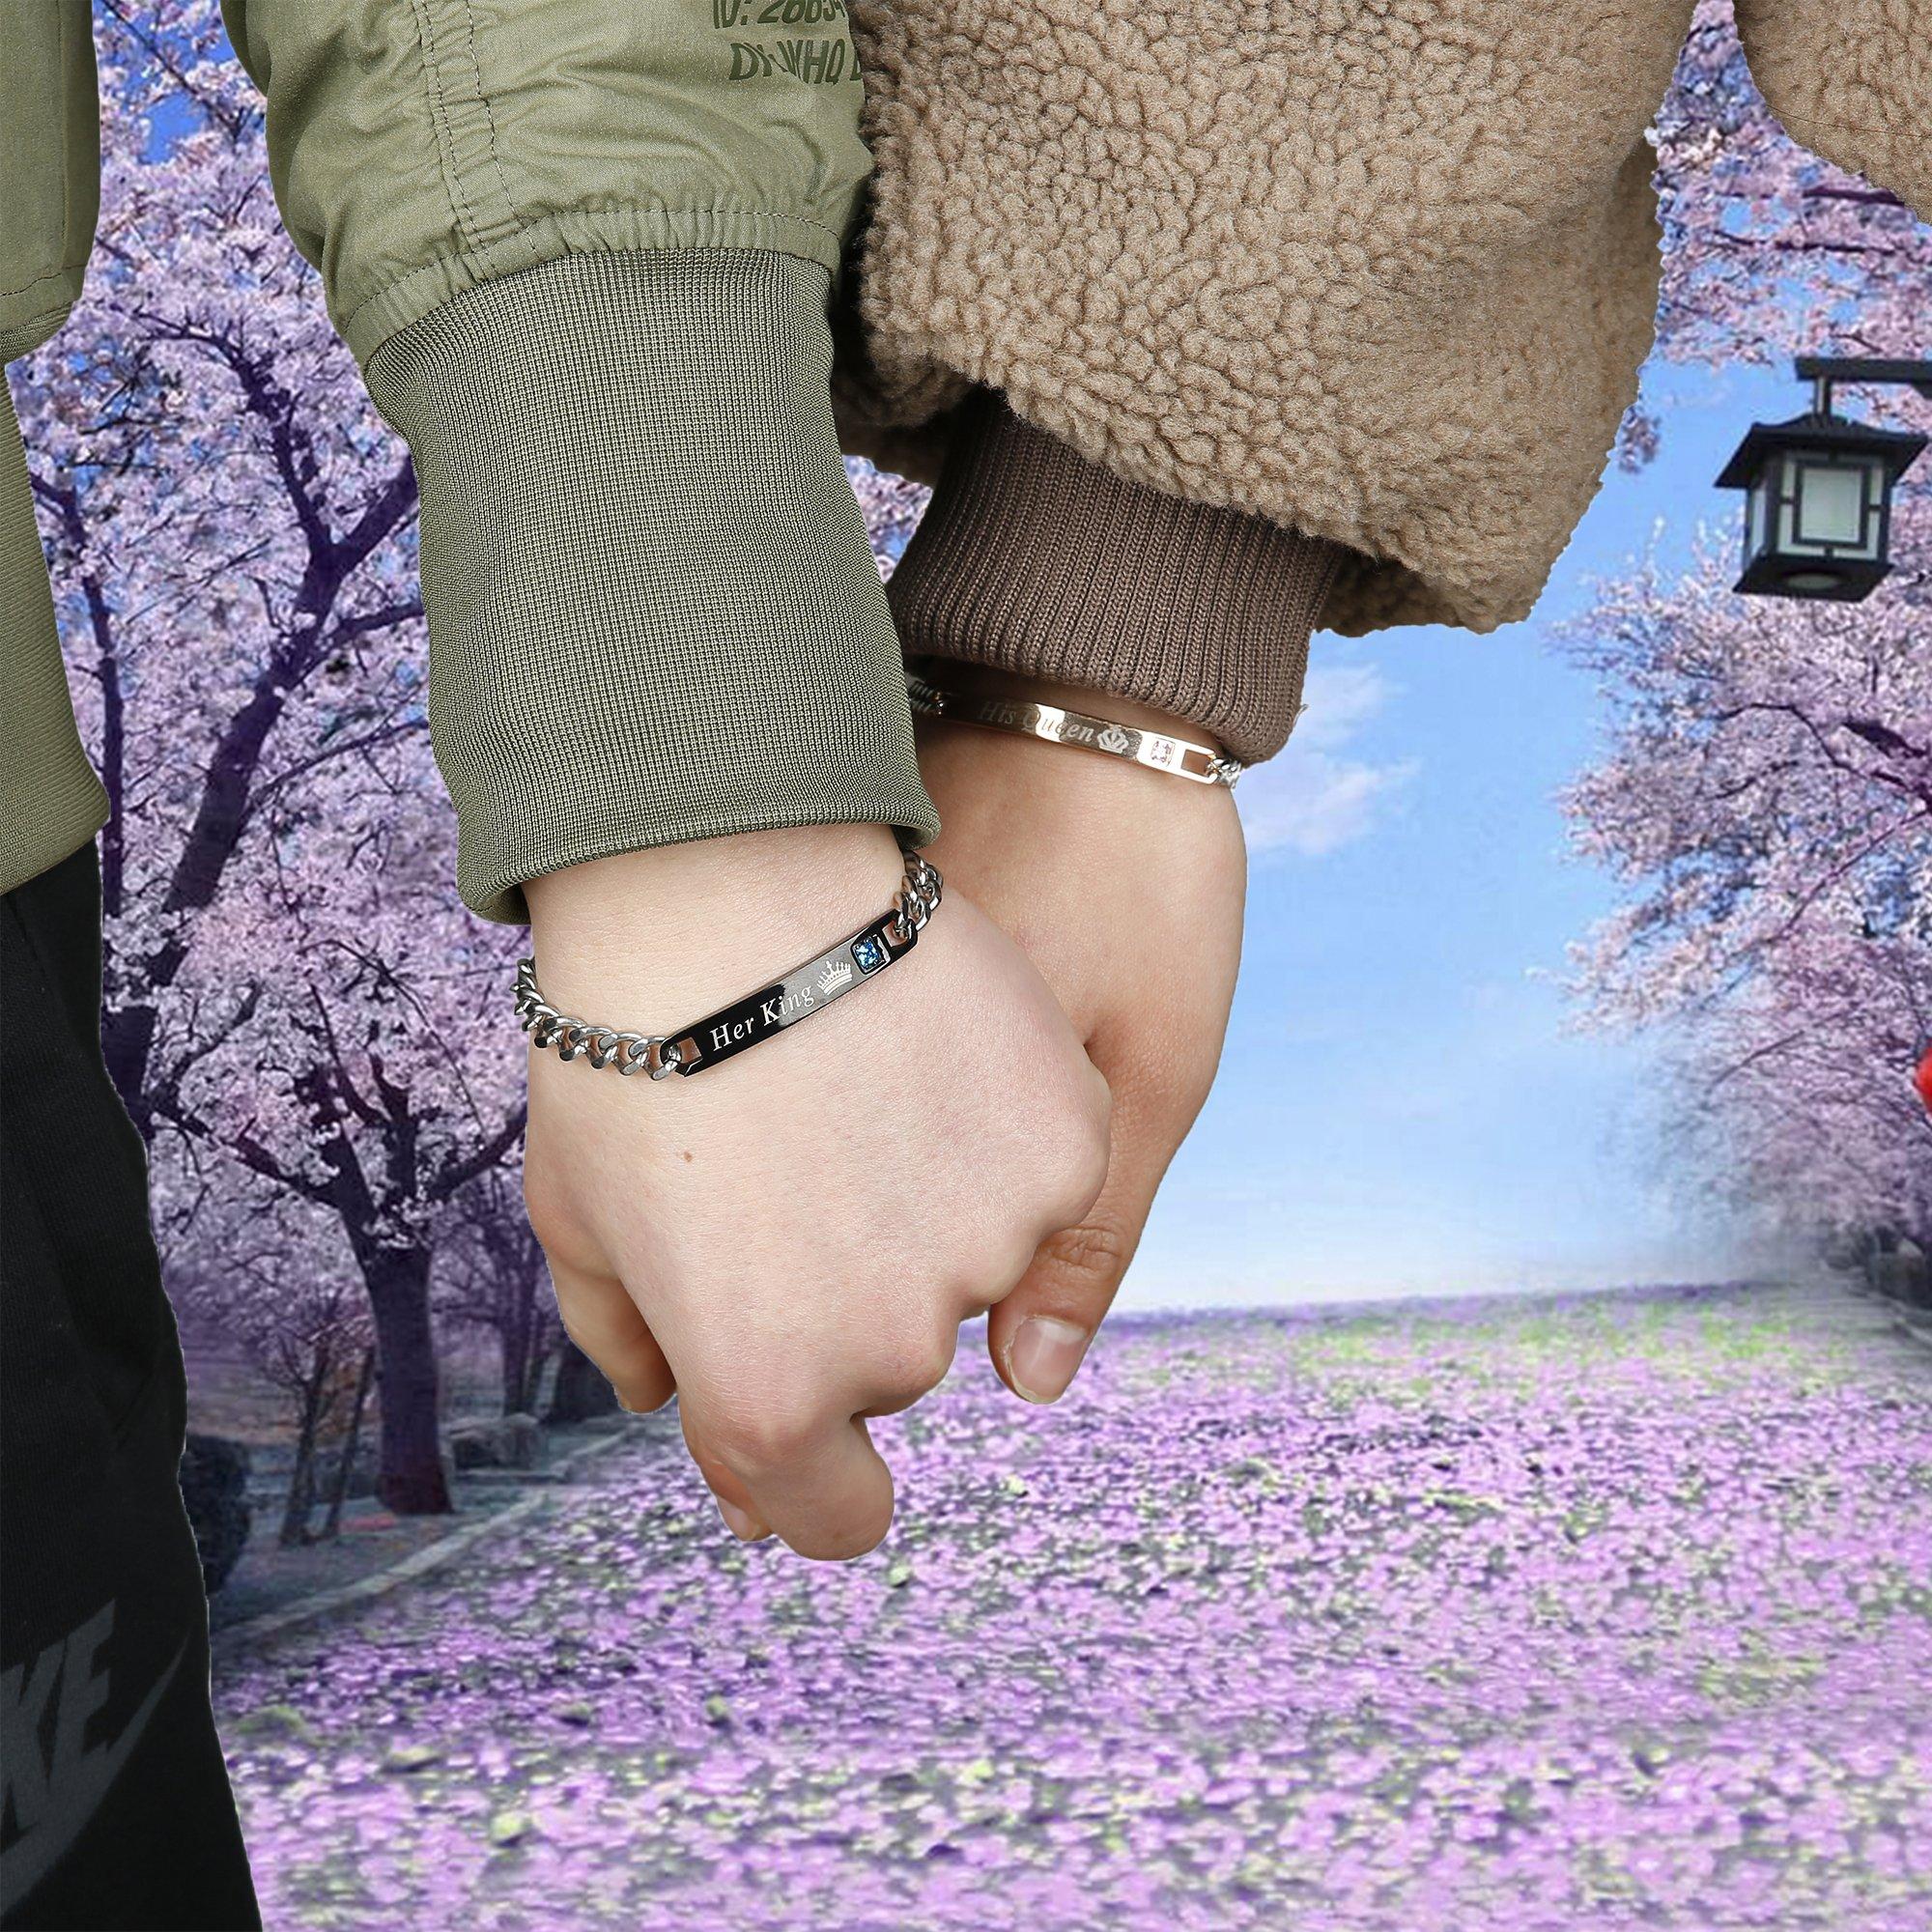 FIBO STEEL 4 Pcs Couples Bracelet for Men Women His & Her Crown Queen Bracelets Set 8mm Beads Bracelets by FIBO STEEL (Image #7)